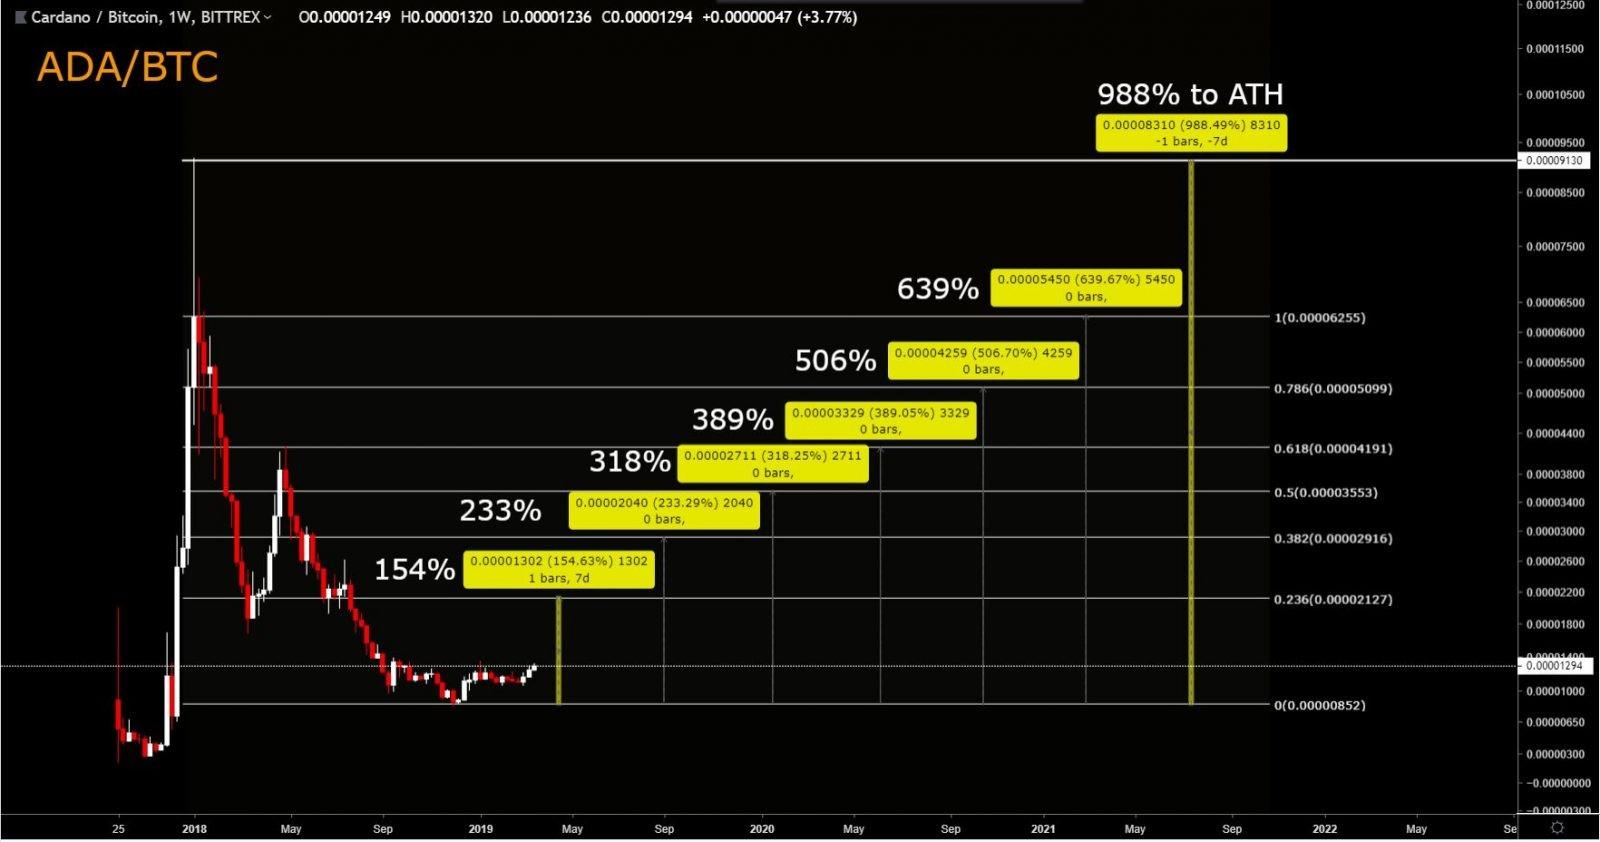 ADABTC, Large investors, trading view